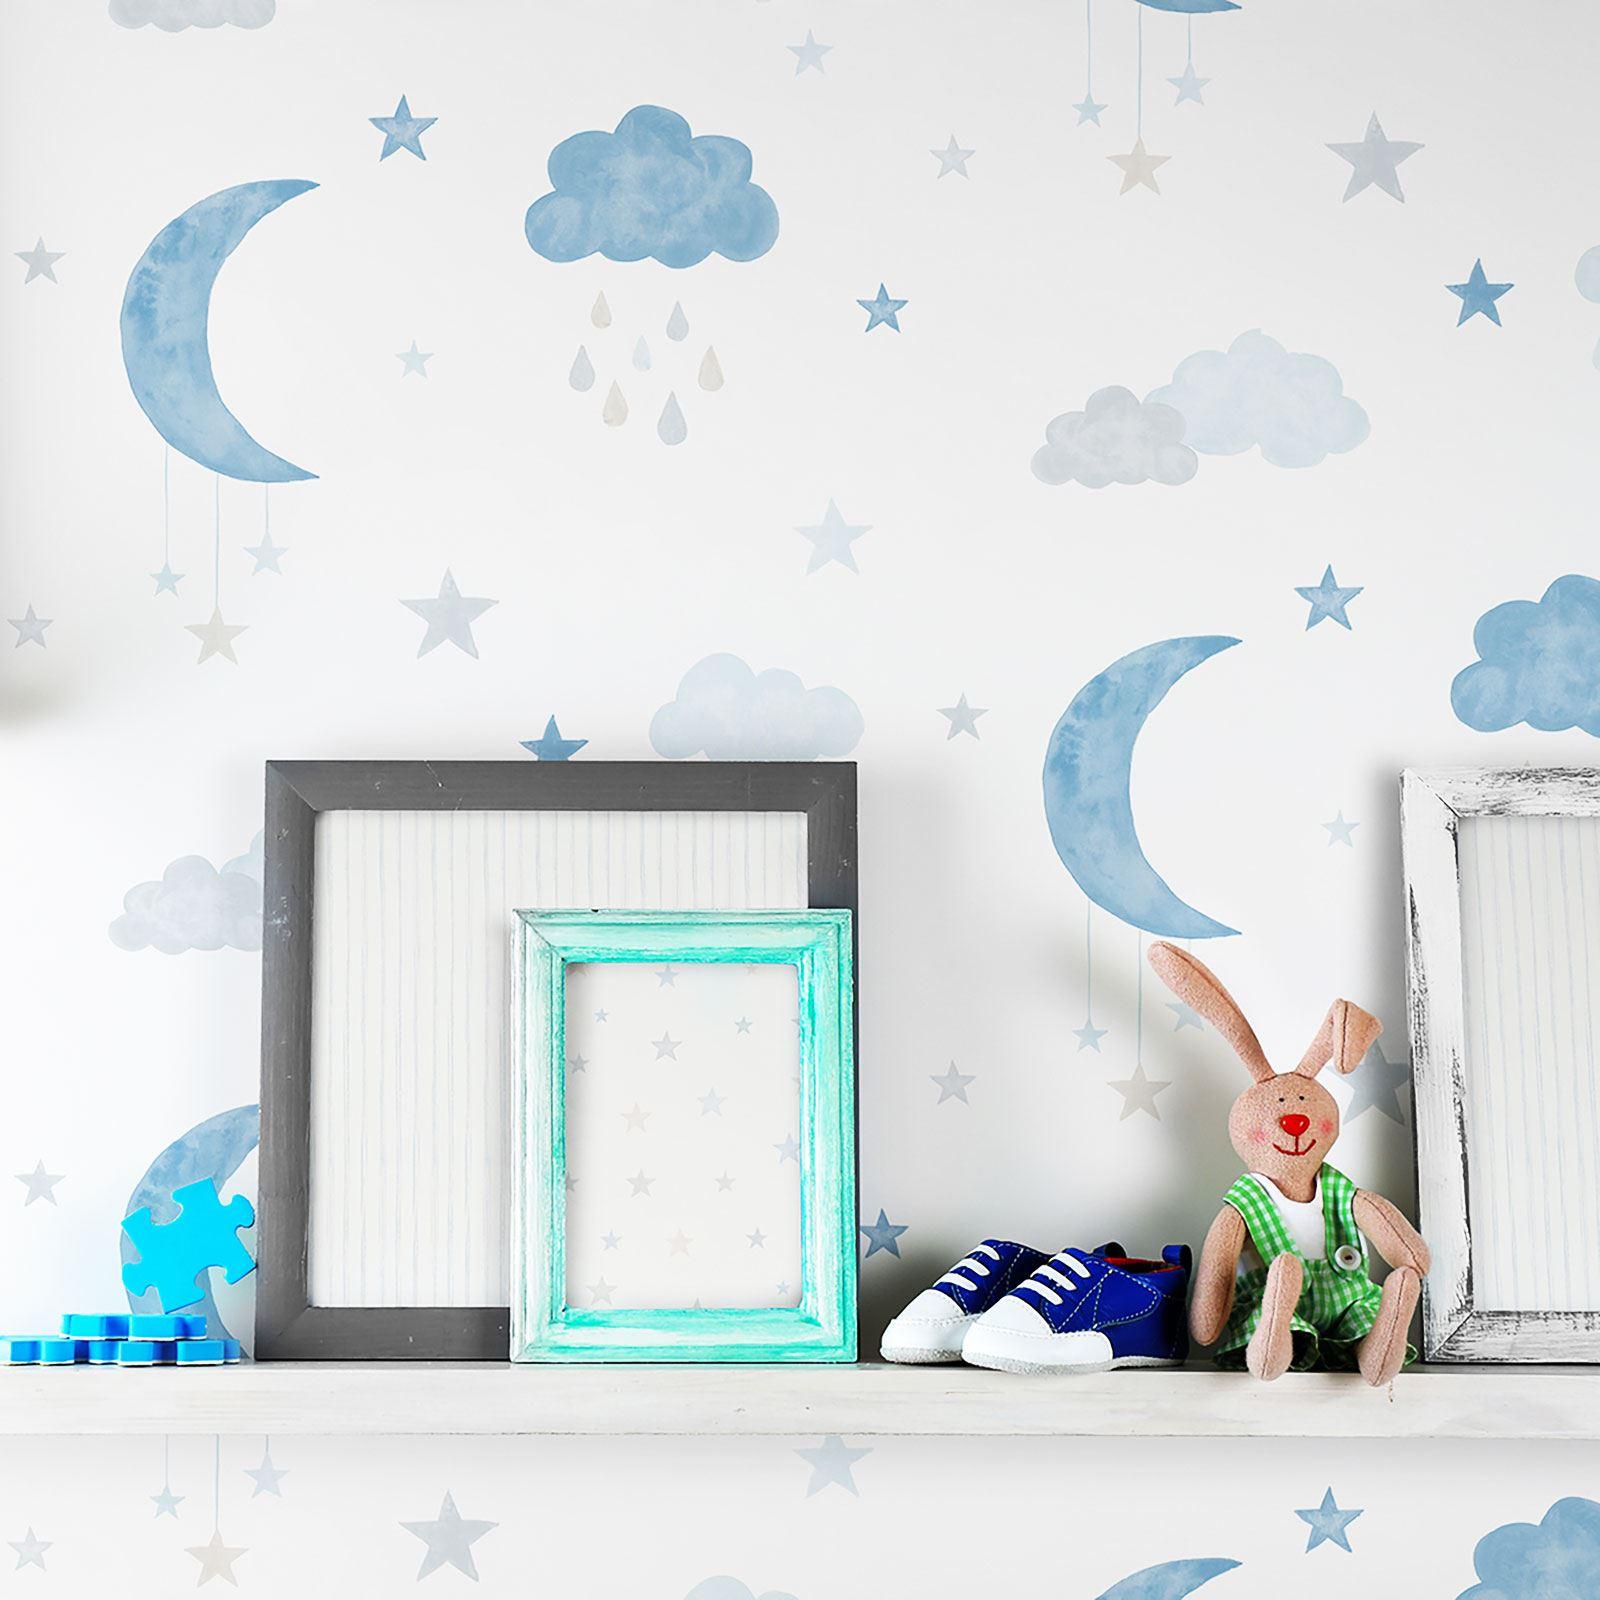 jungen tapete schlafzimmer dekor fahrzeuge raum. Black Bedroom Furniture Sets. Home Design Ideas